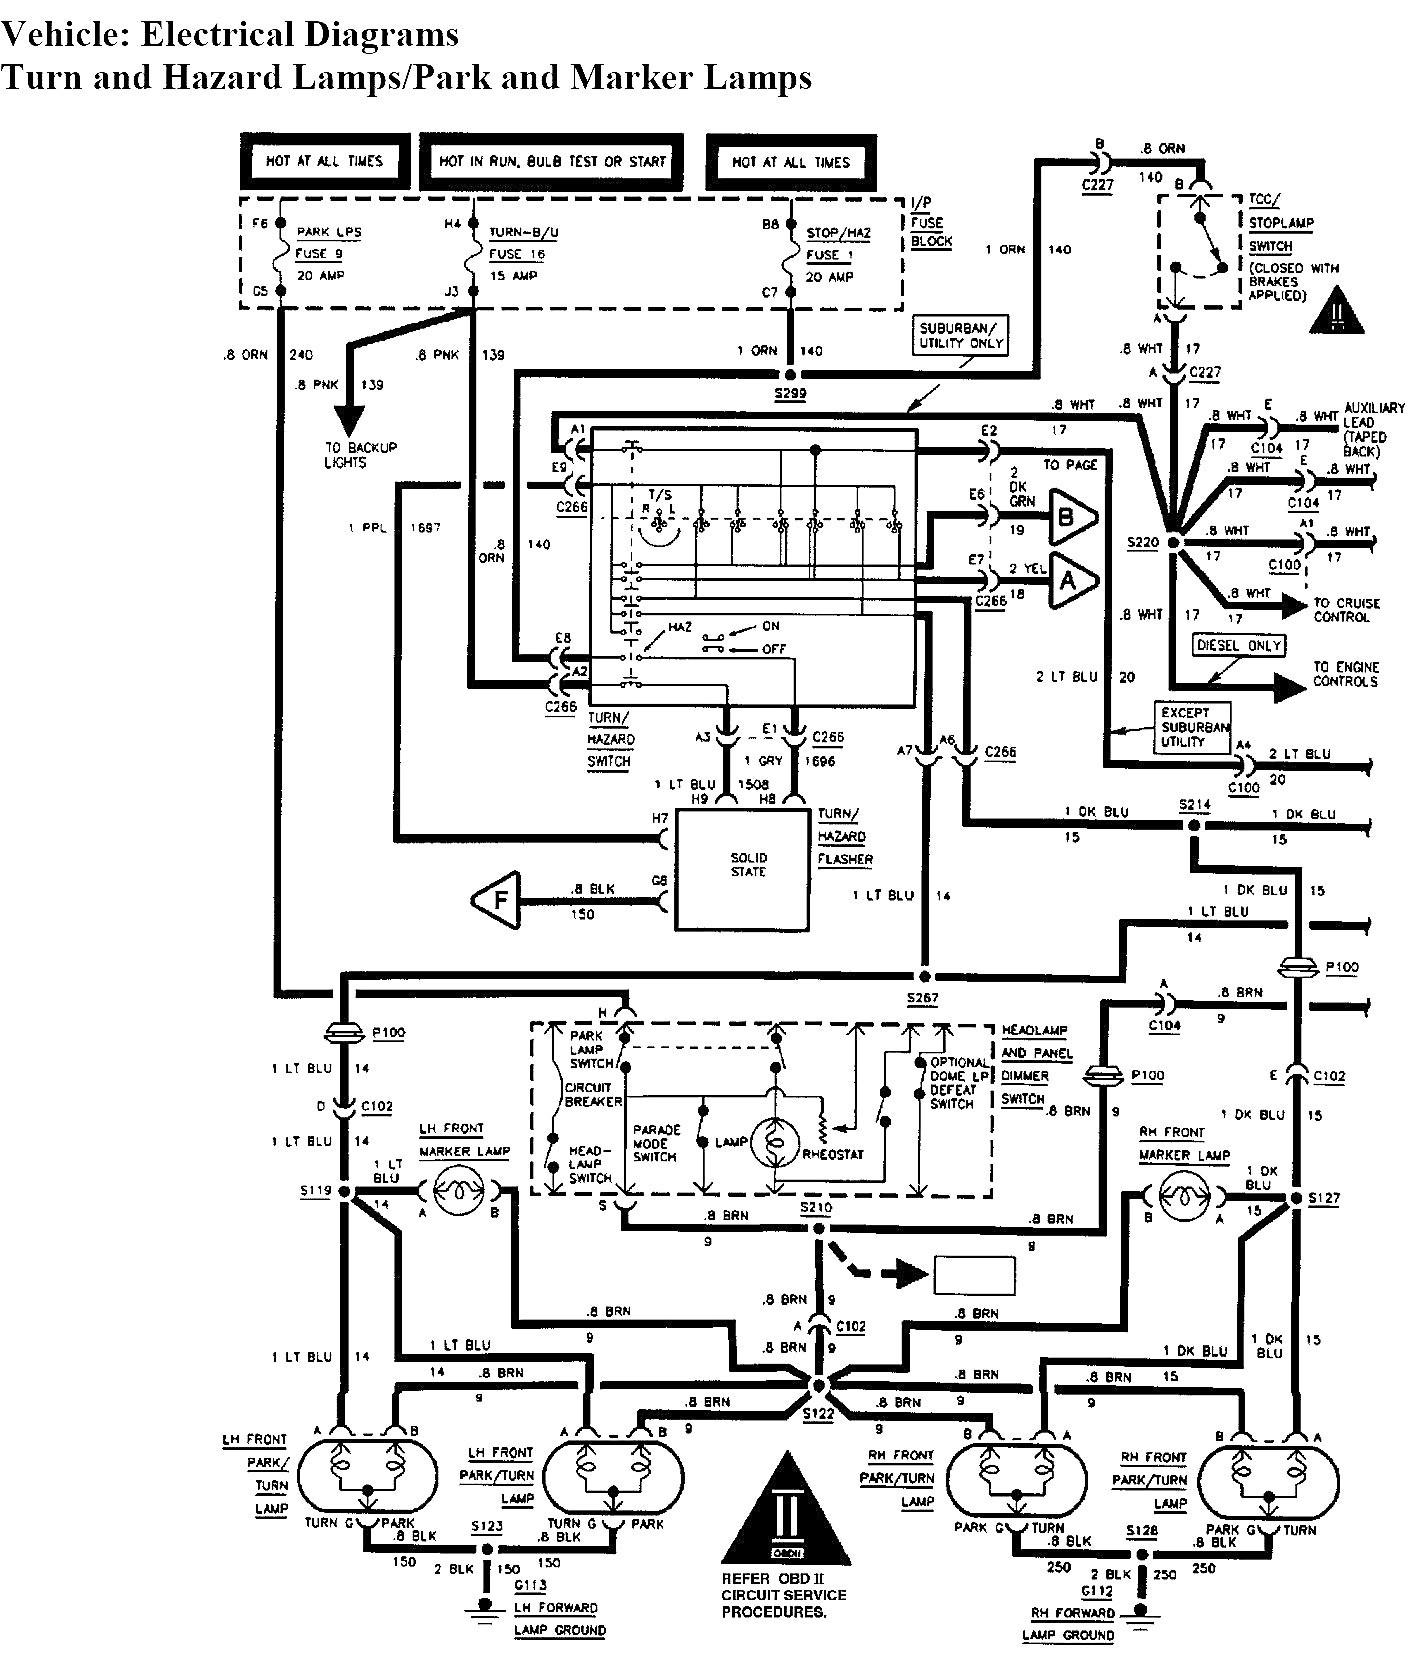 2006 silverado signal light wiring diagram